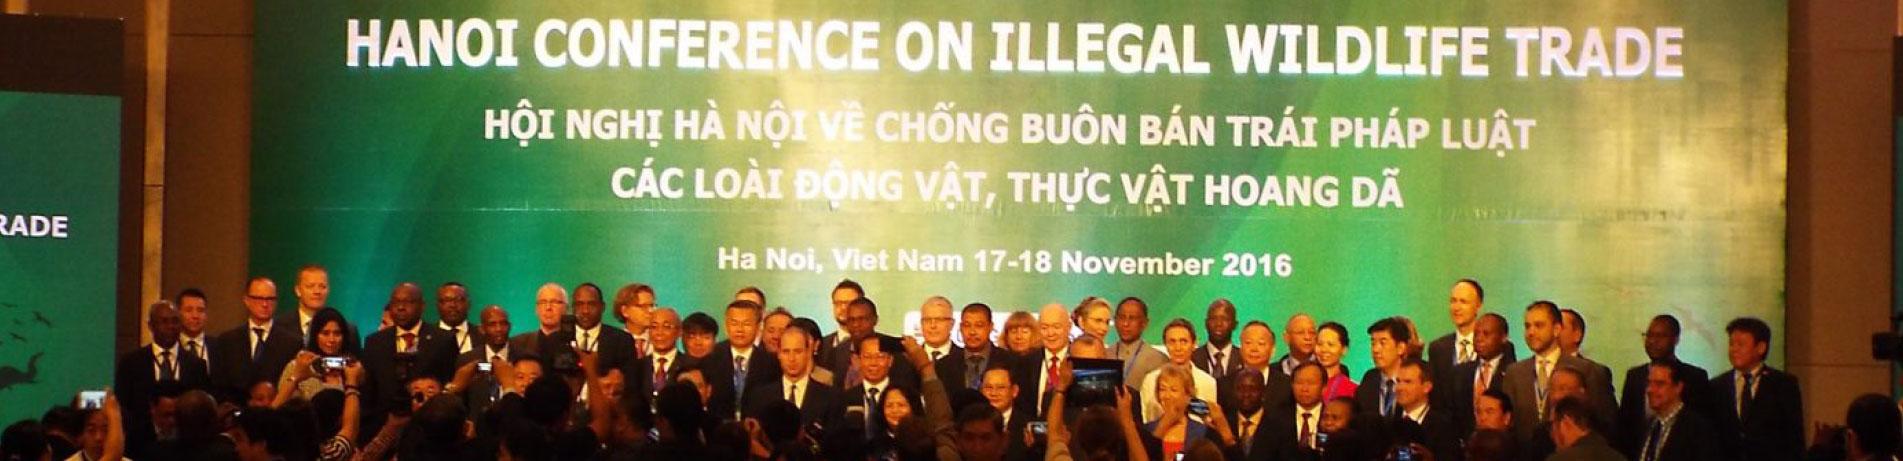 Delegates at the Hanoi Conference on Illegal Wildlife Trade, Vietnam (17-18 November 2016)